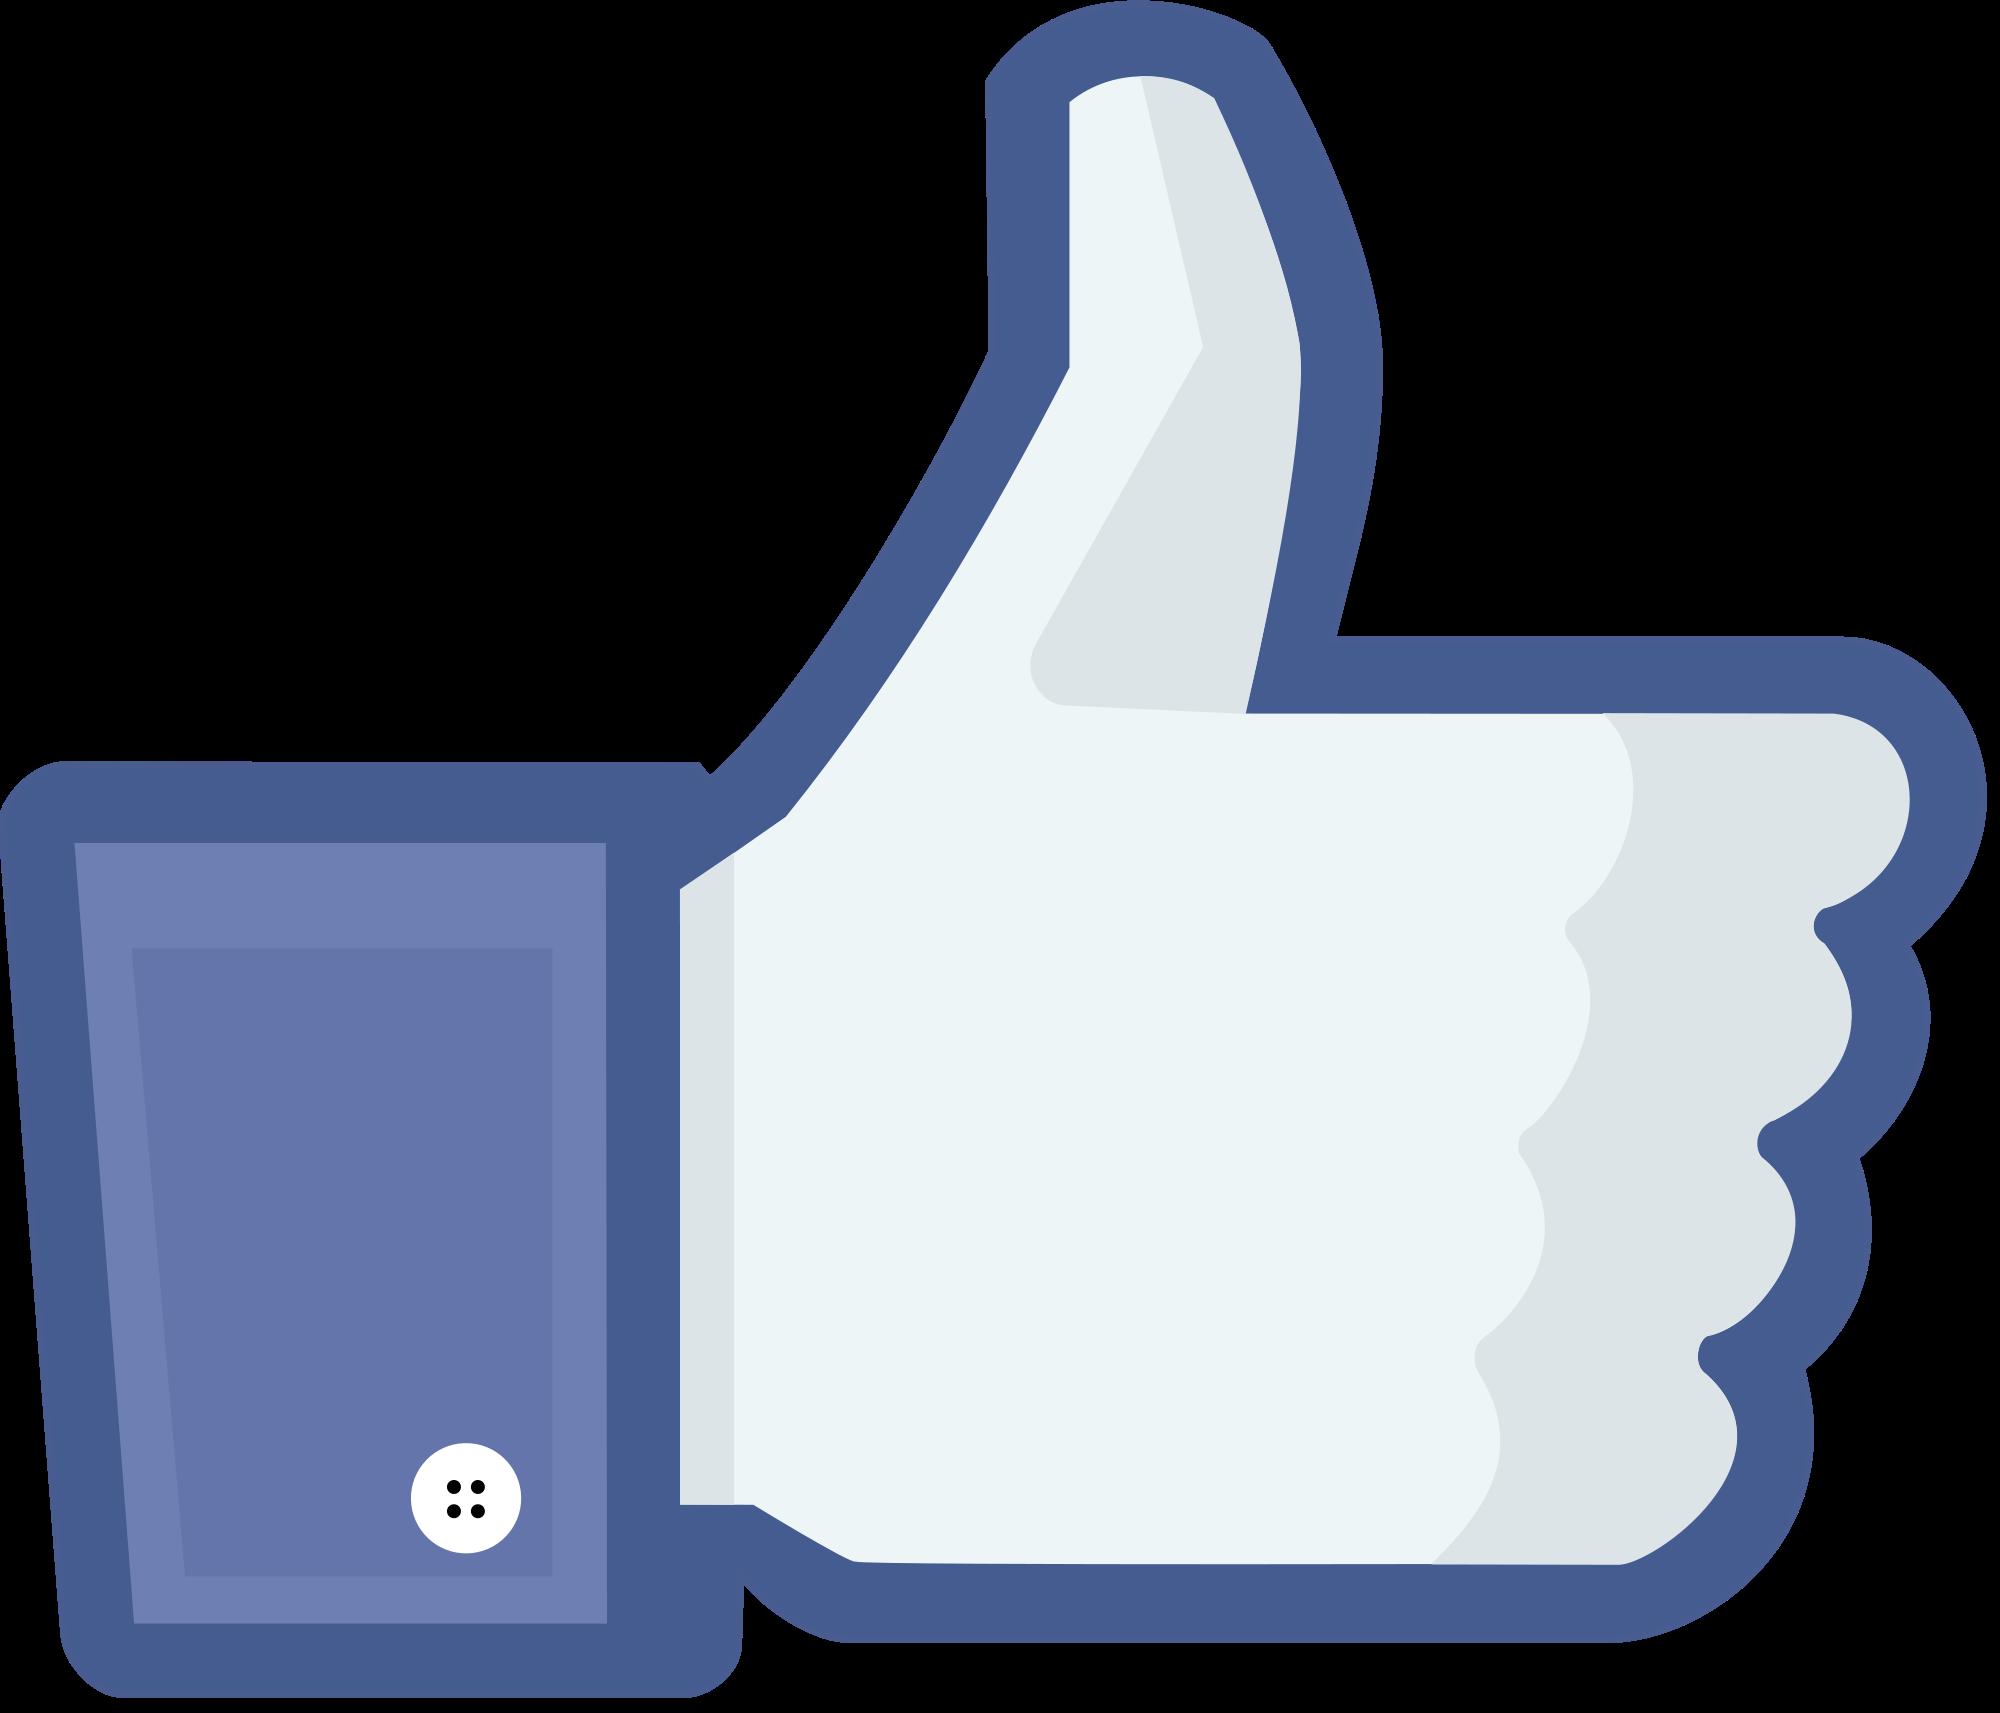 Dale like clipart svg library Facebook Like PNG Images Transparent Free Download | PNGMart.com svg library